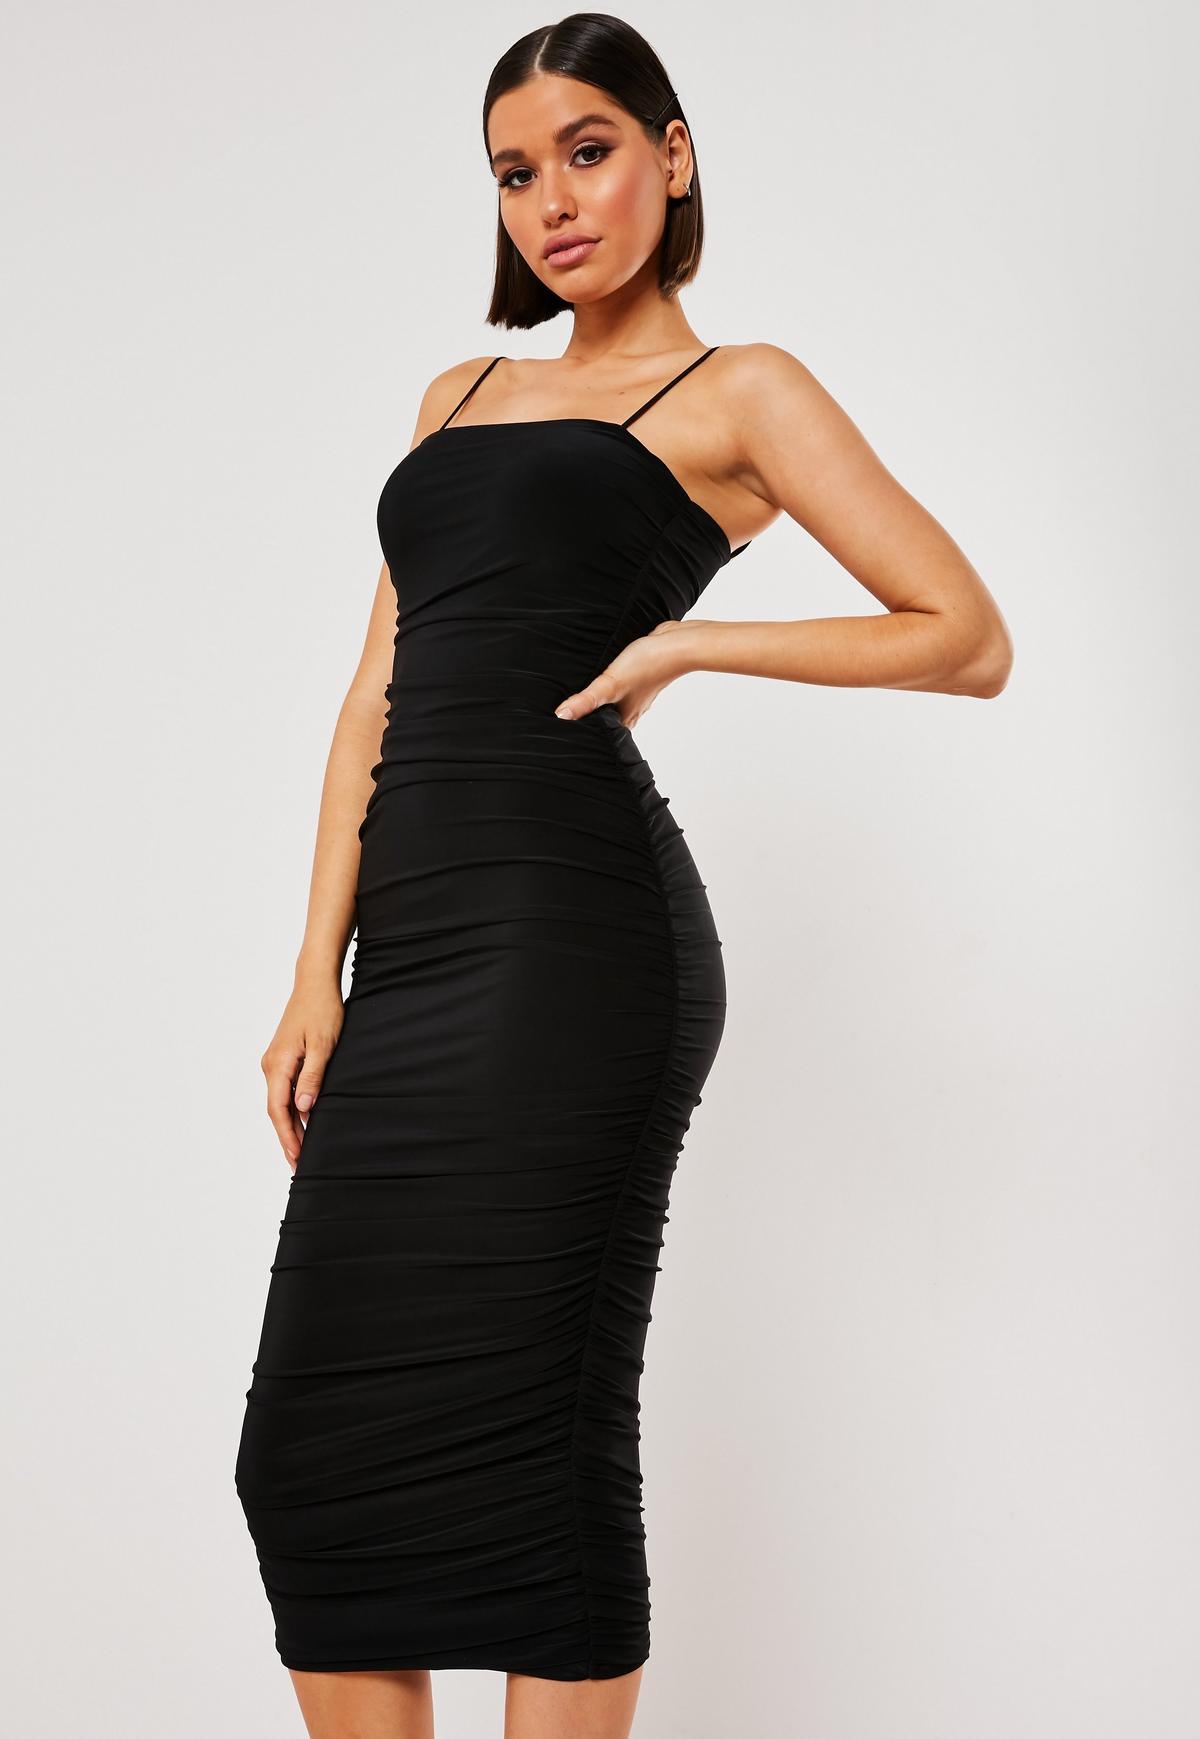 Plum color dress - All women dresses